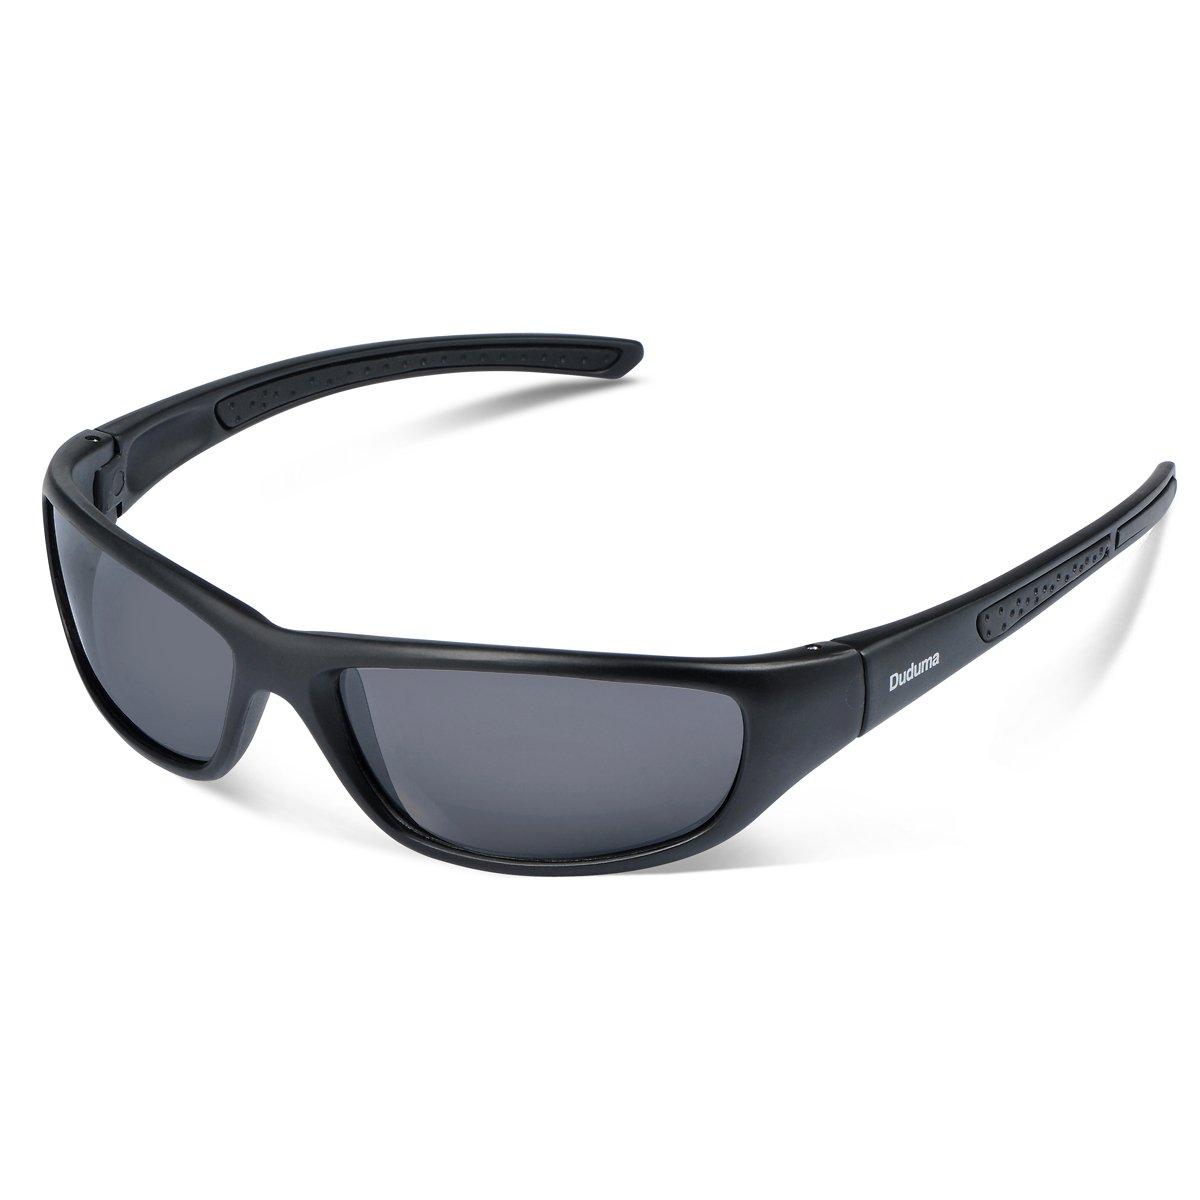 f097019e1fd Best Rated Polarized Sunglasses For Men - Restaurant and Palinka Bar